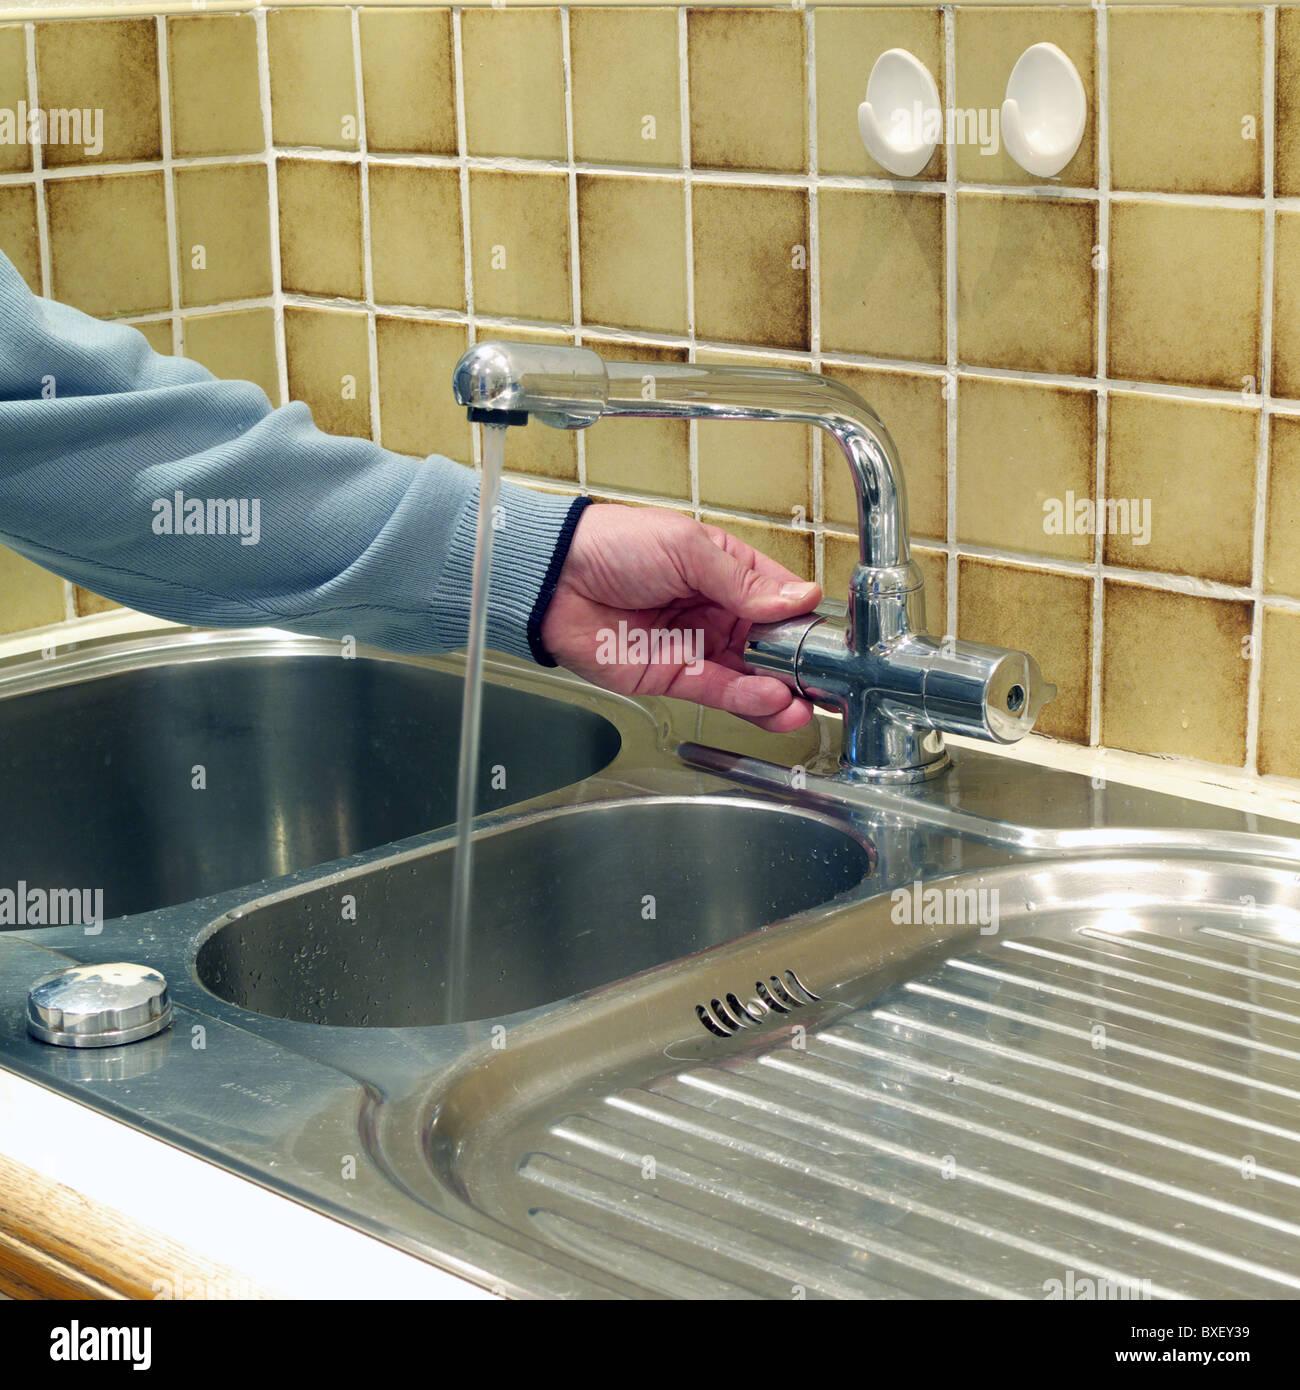 Turning Off Water Stockfotos & Turning Off Water Bilder - Alamy